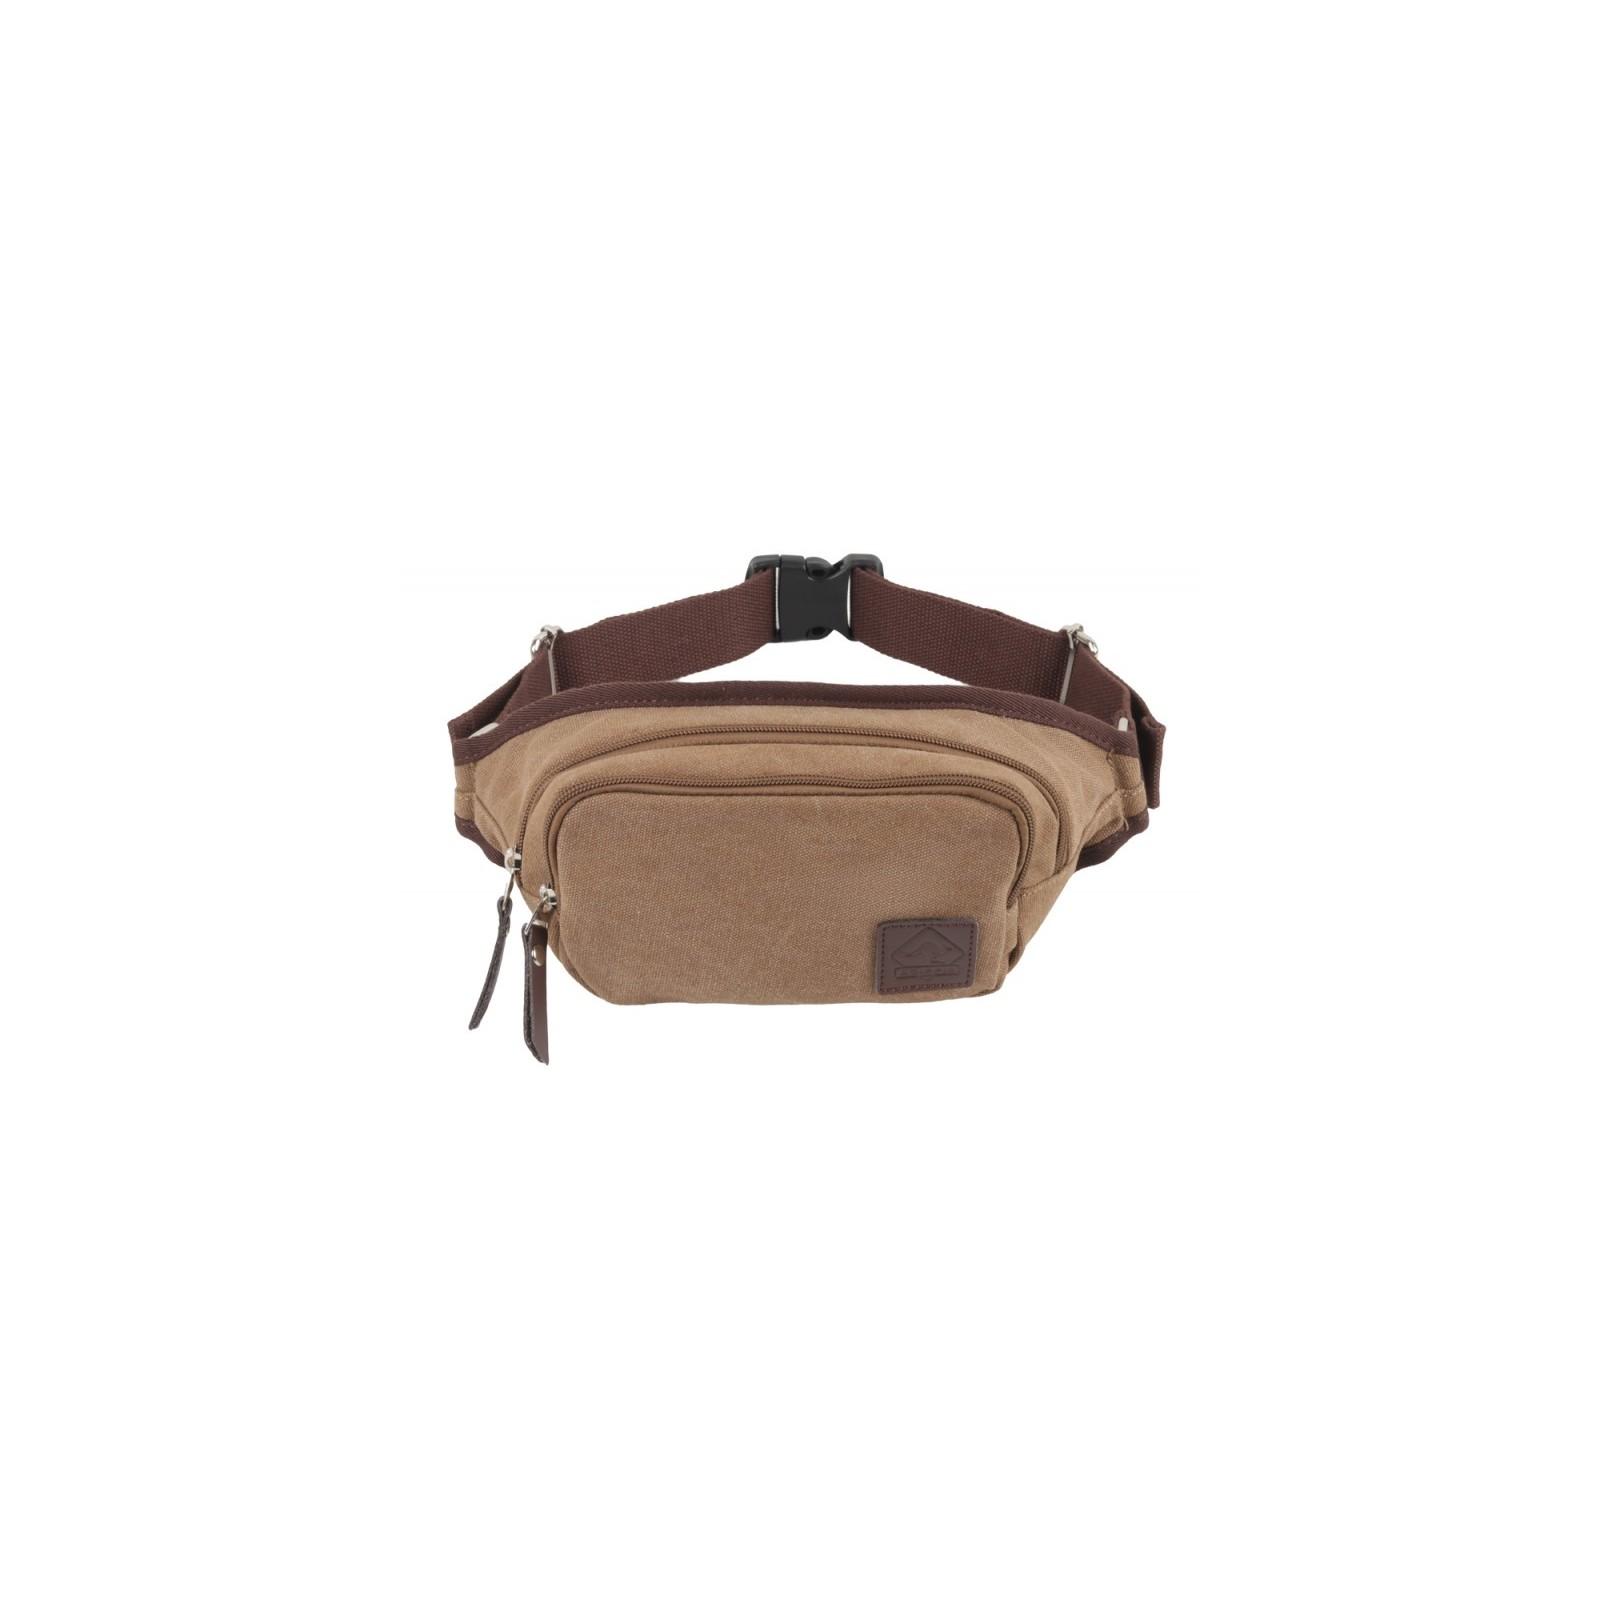 Scippis Gold Coast Waist Bag